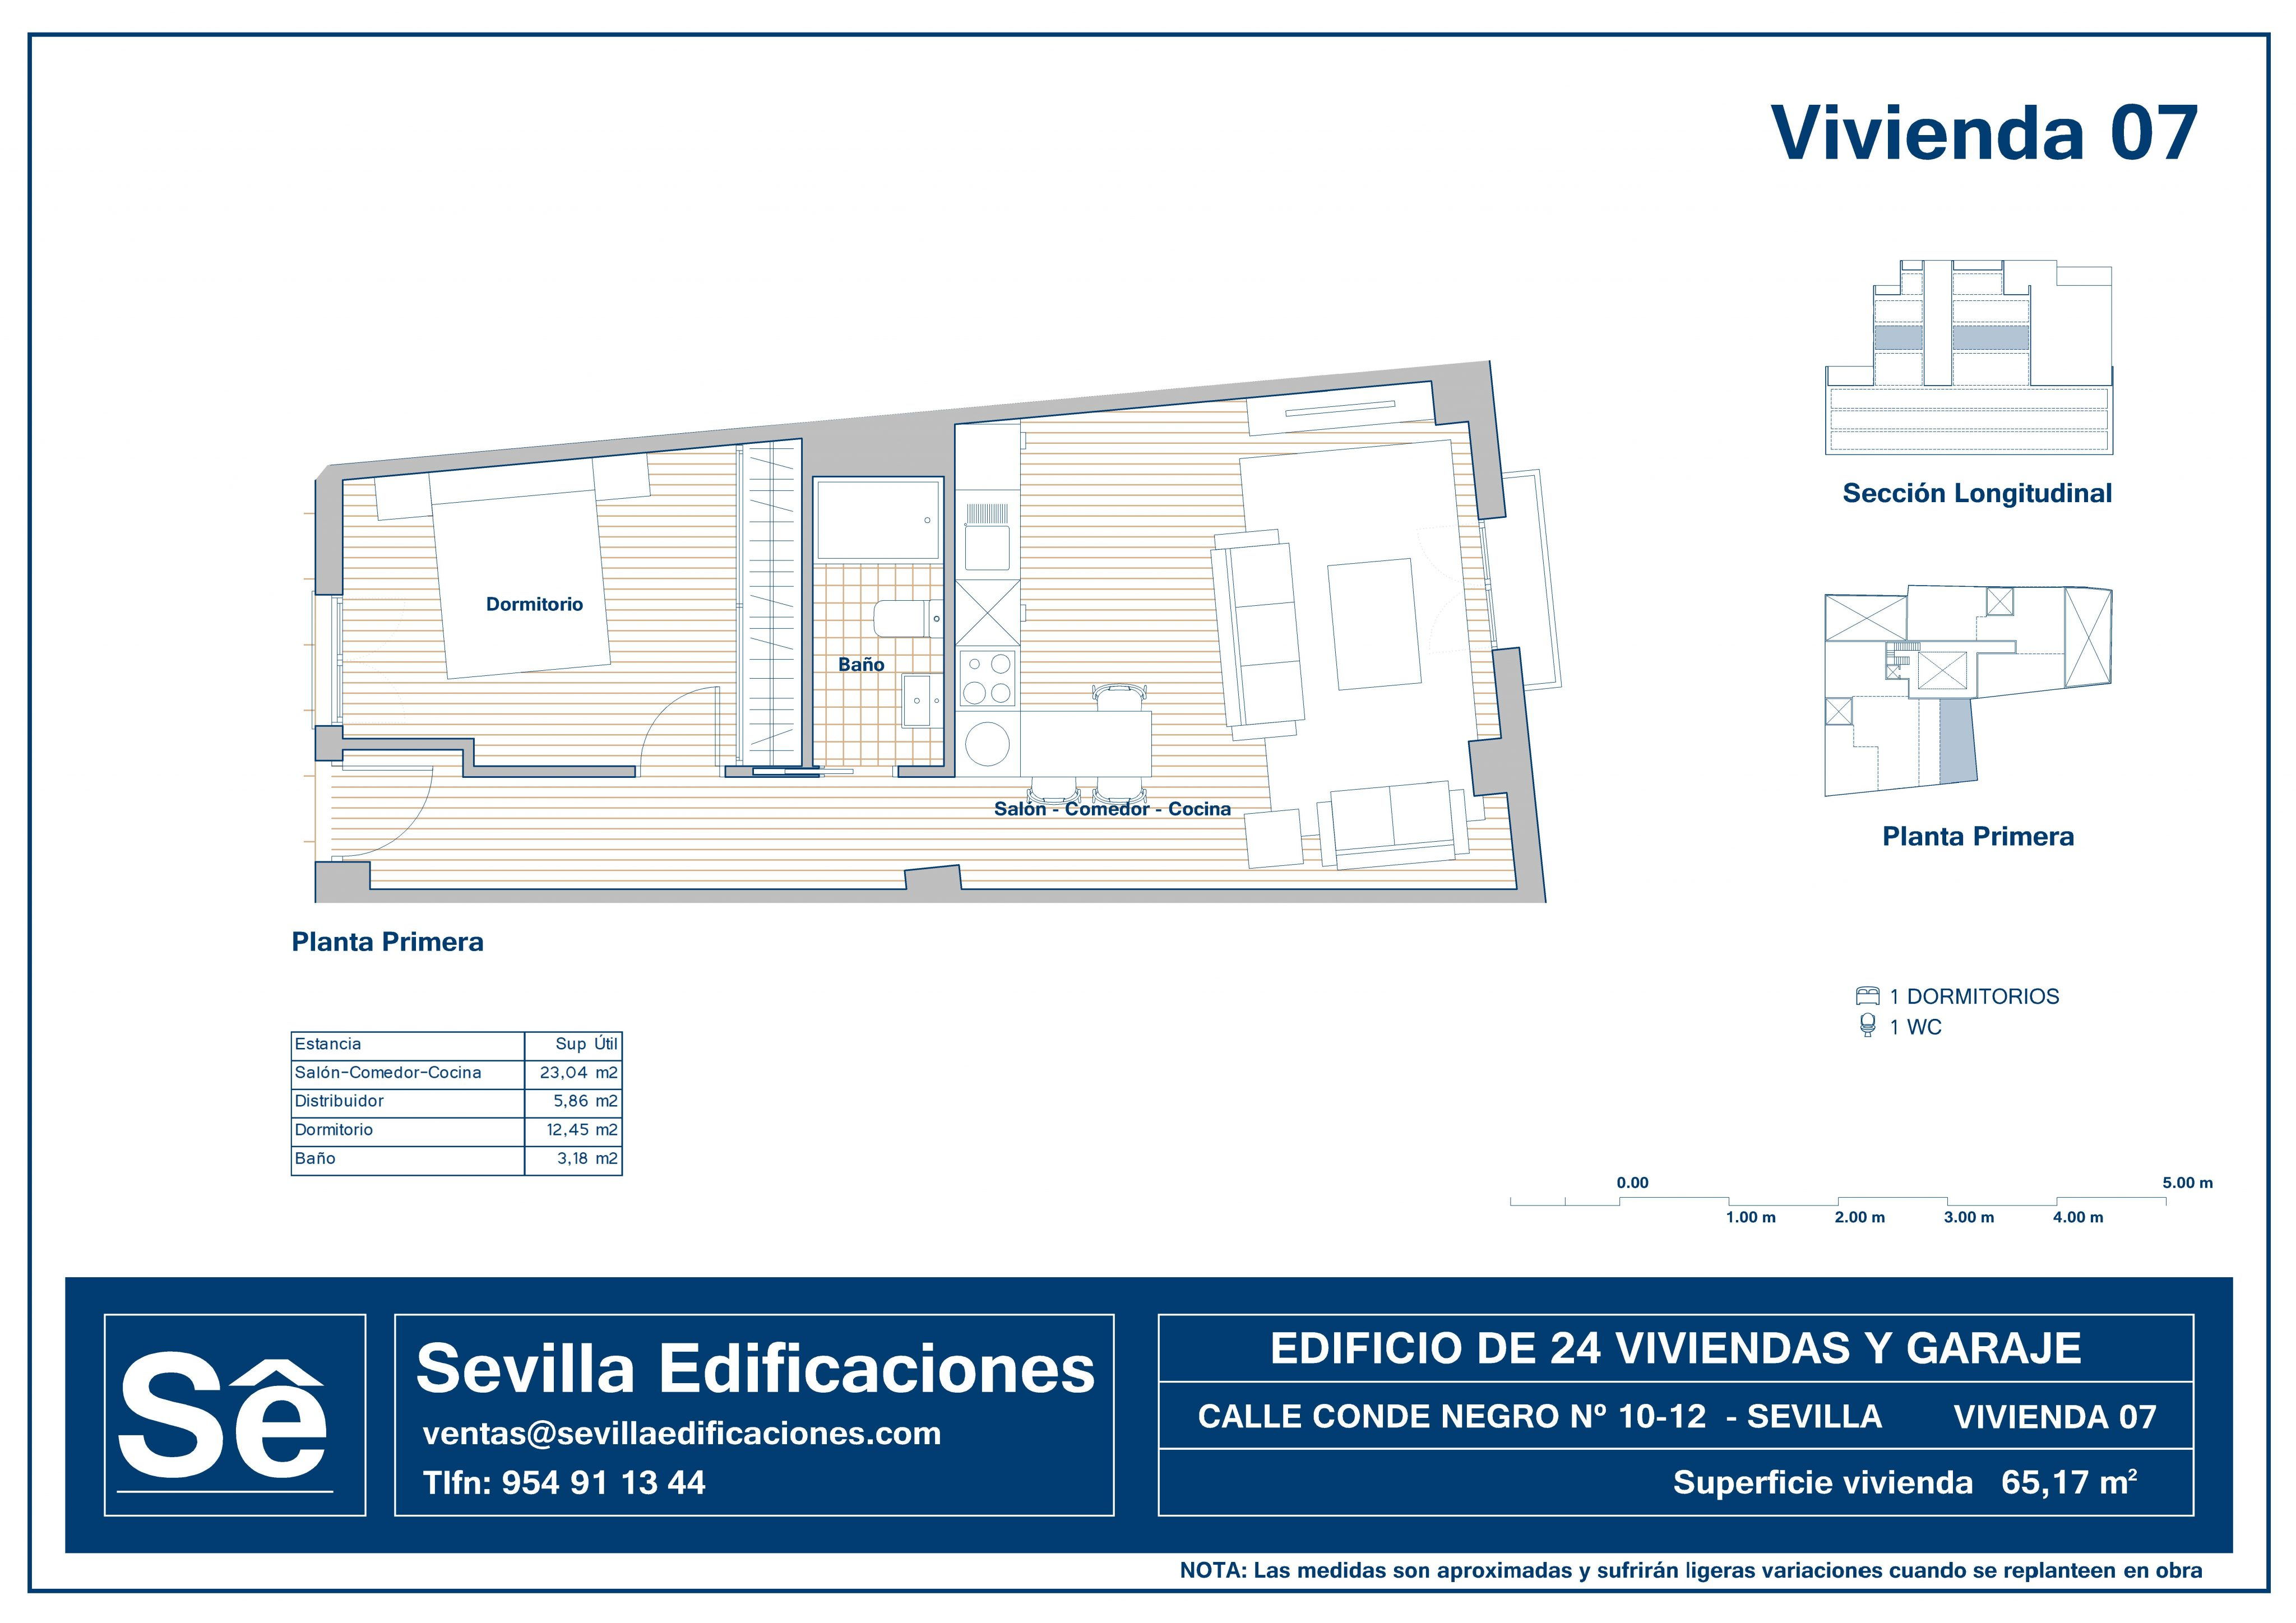 CONDENEGRO_VIVIENDA_07